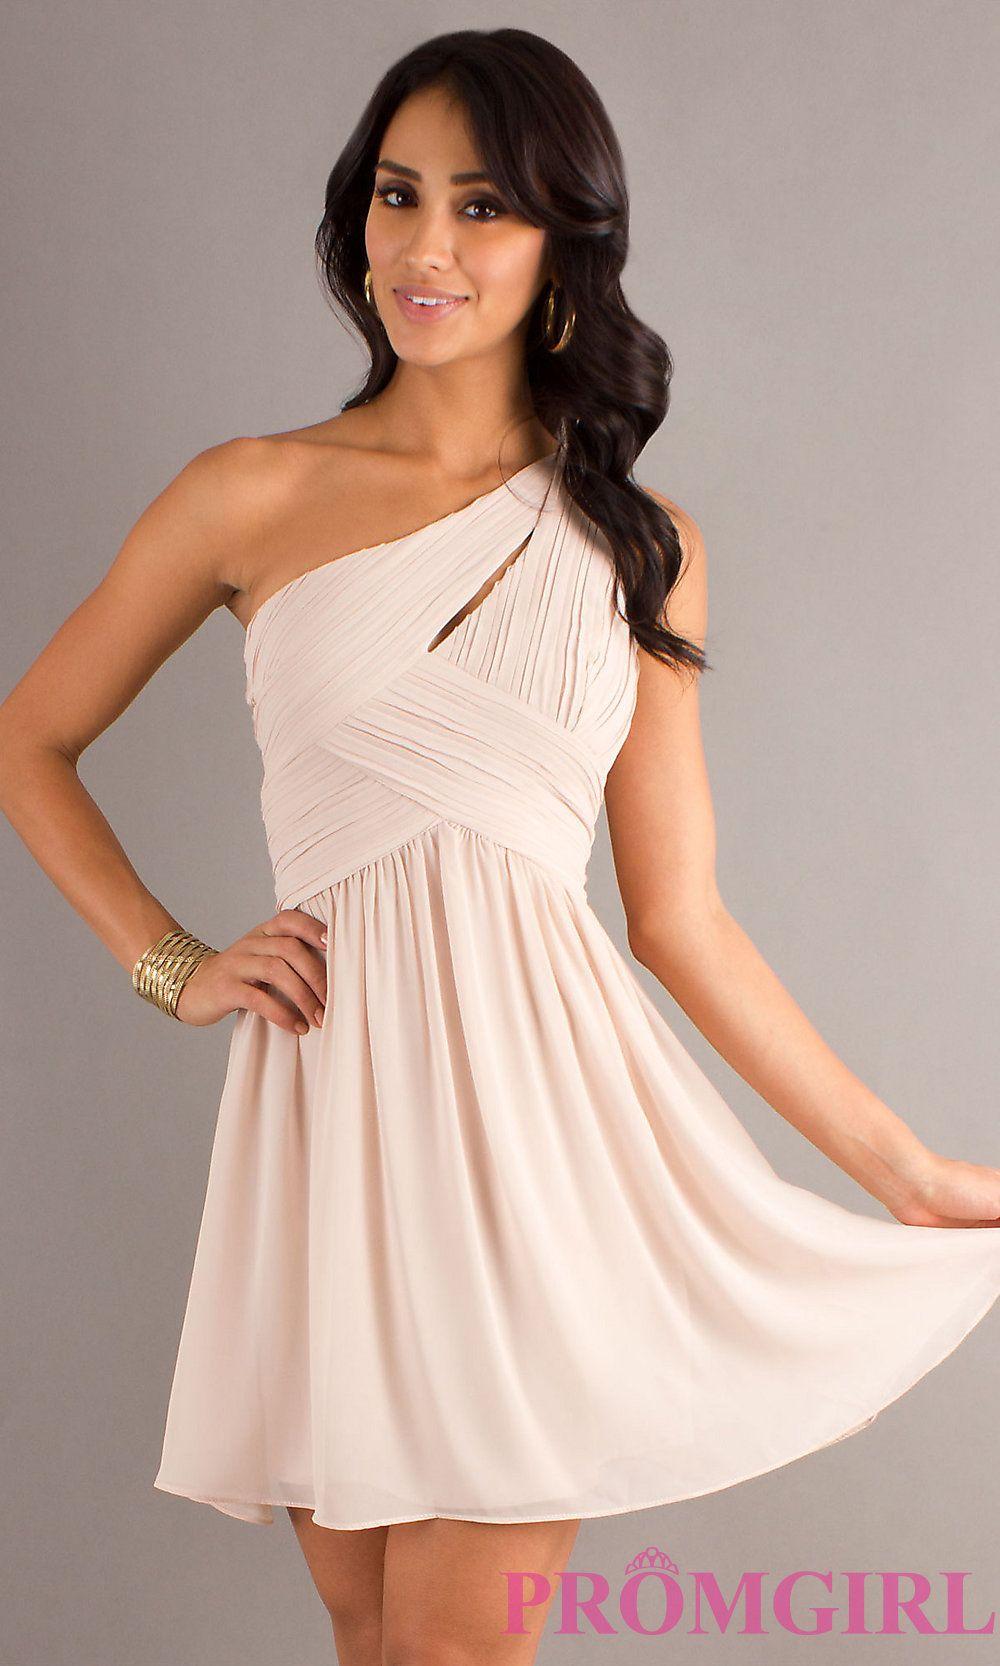 Short one shoulder dress junior prom dress promgirl short prom